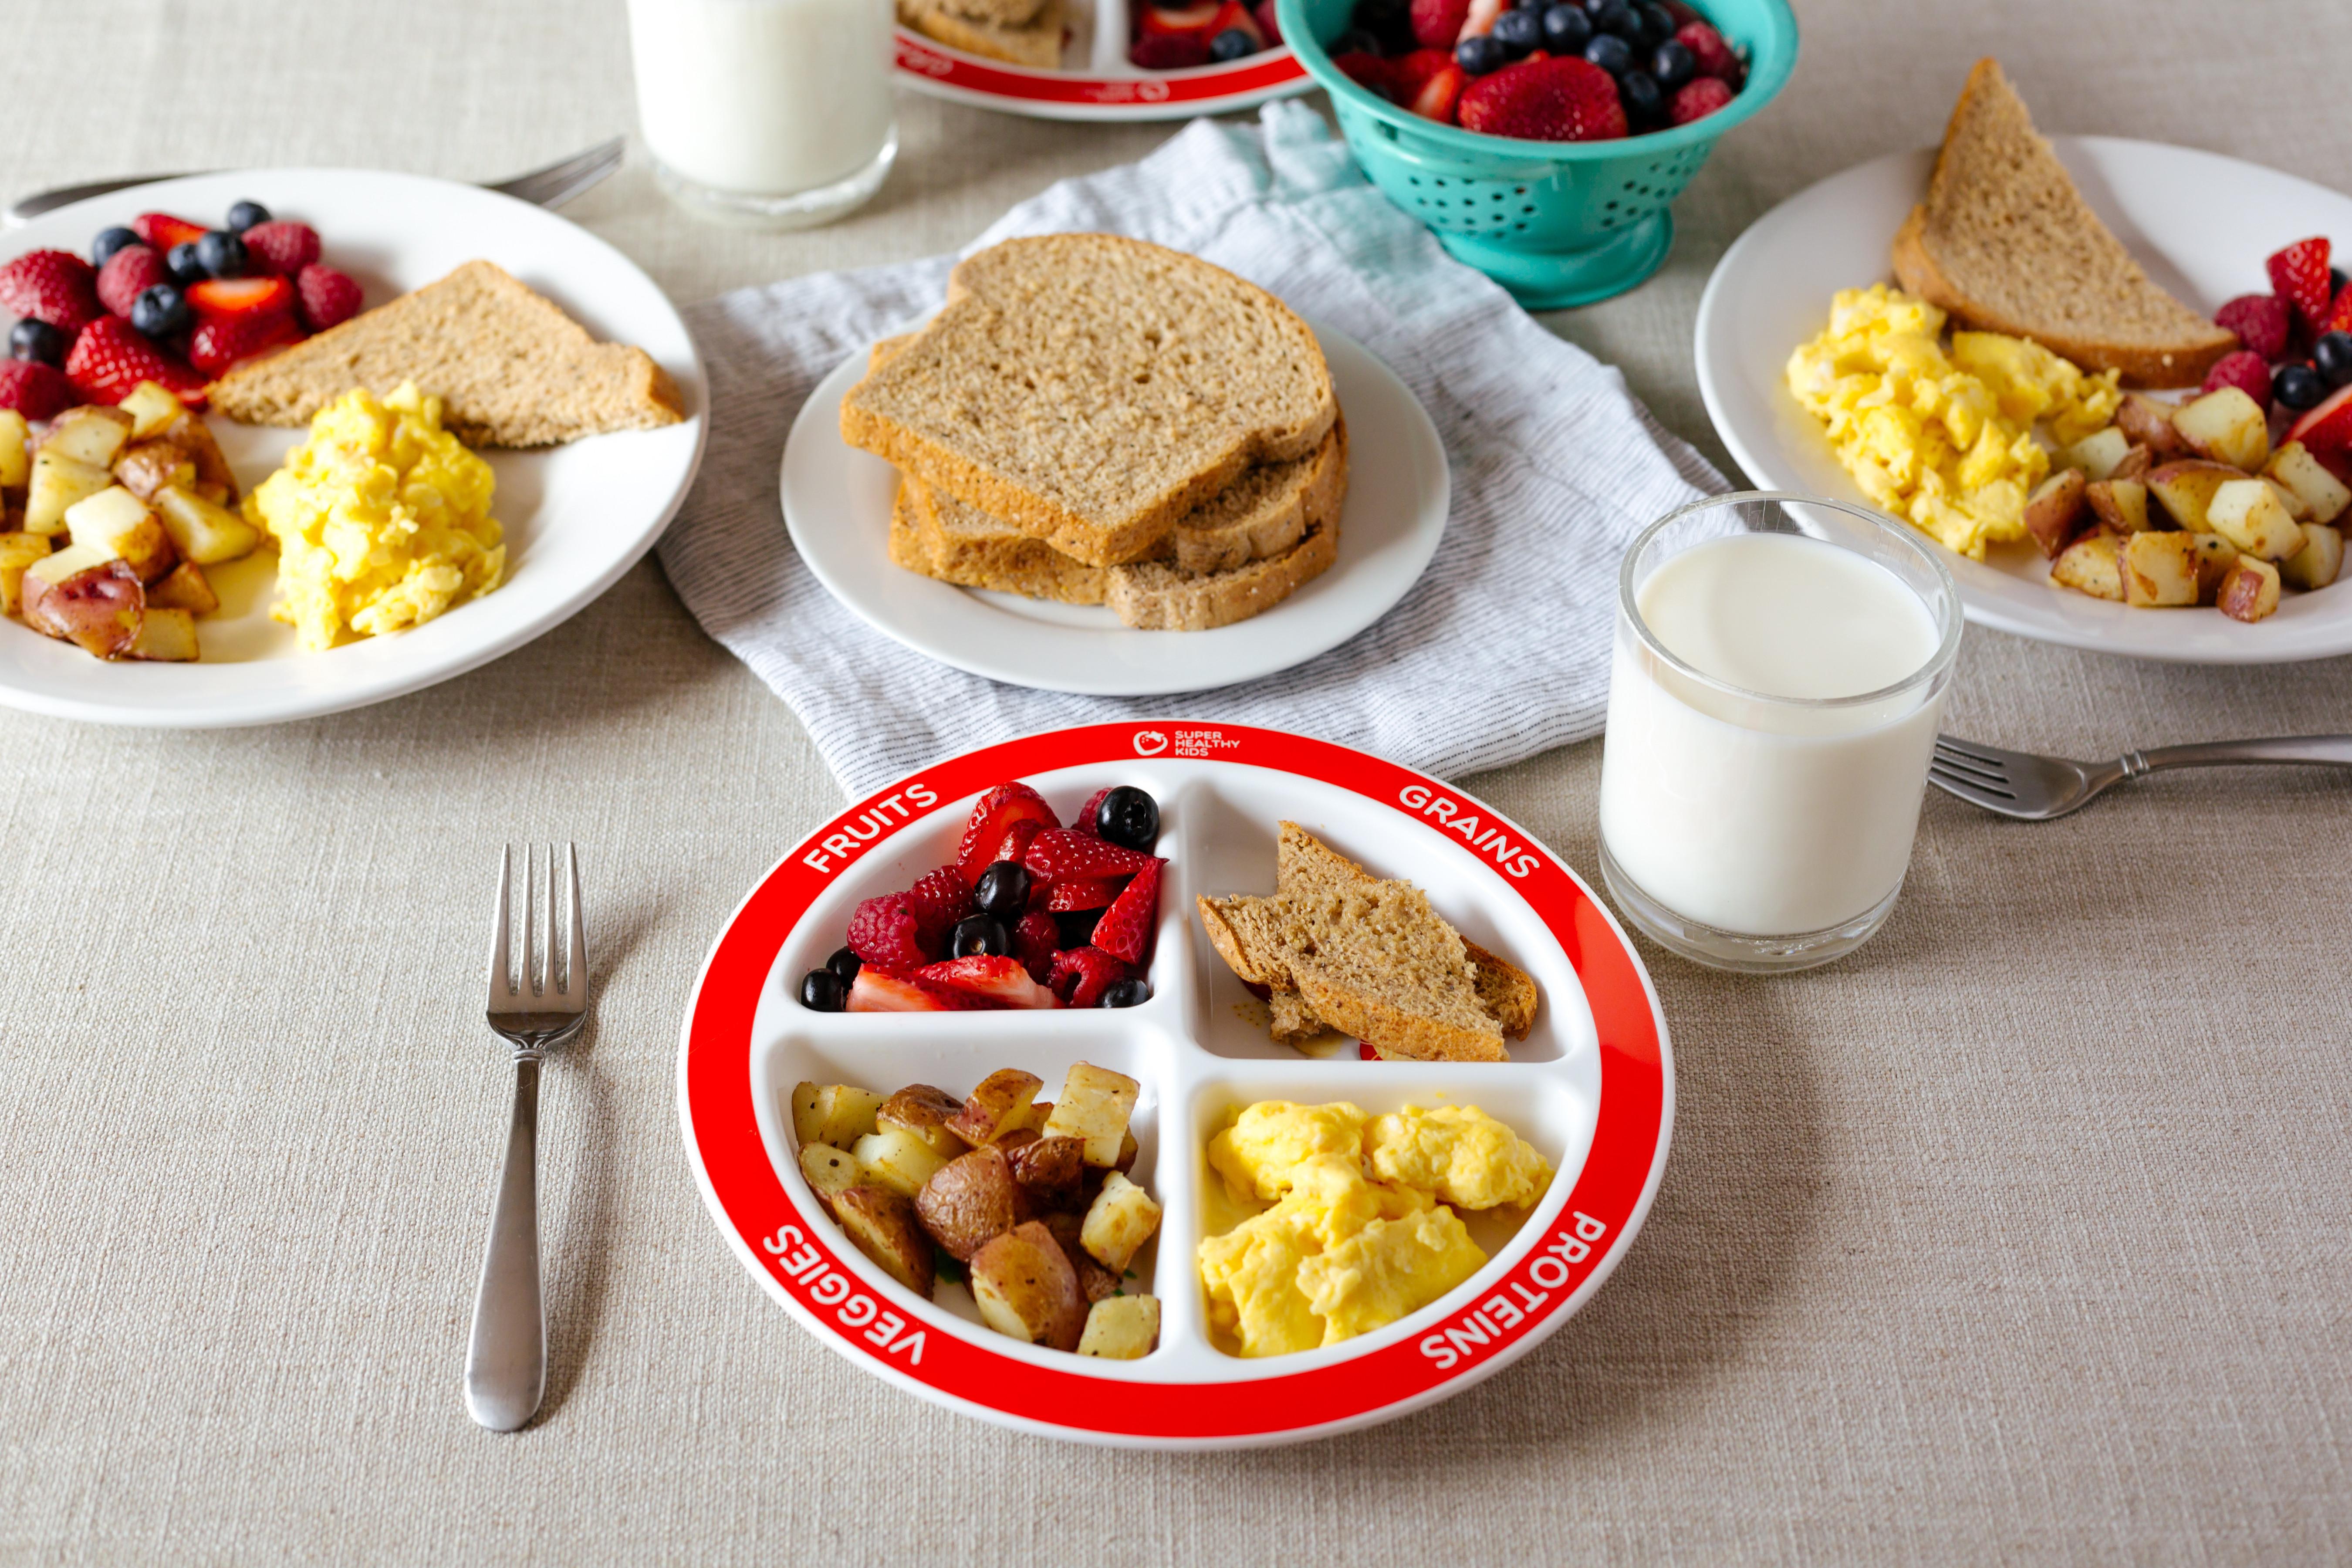 Healthy Breakfast Foods For Kids  Healthy Balanced Breakfast with MyPlate